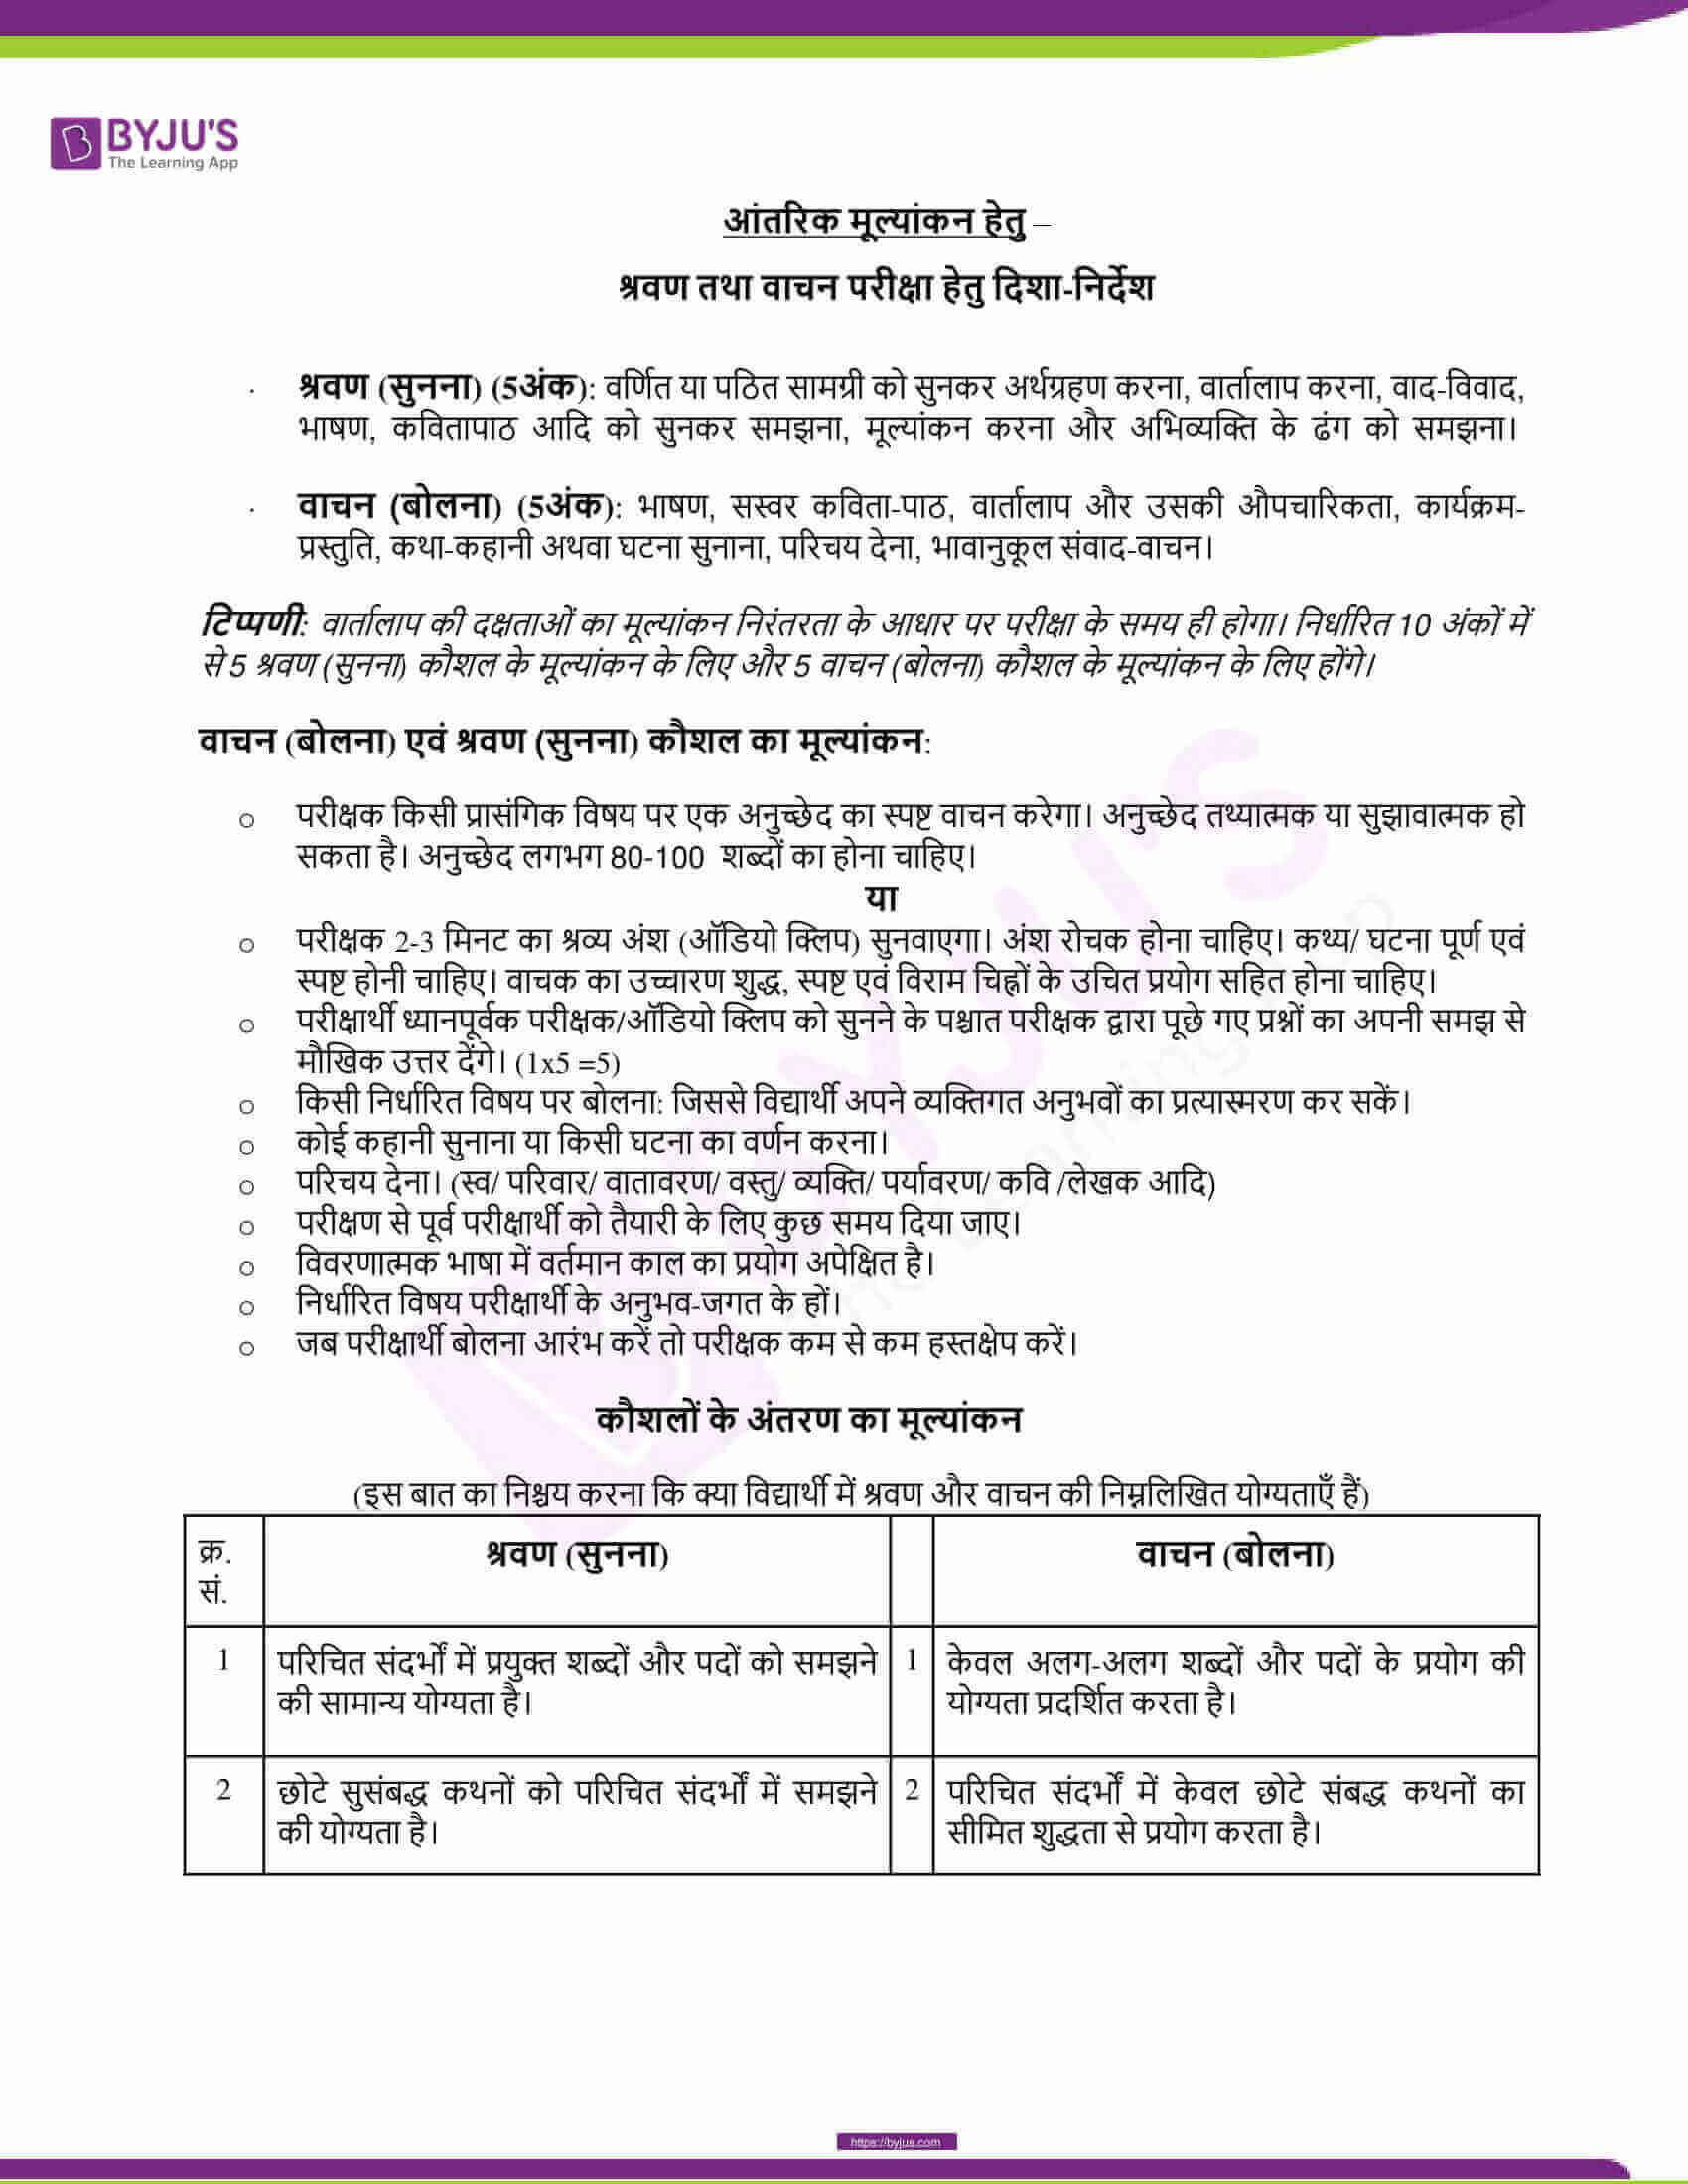 CBSE Class 10 Hindi Course B Revised Syllabus 2020 21 03